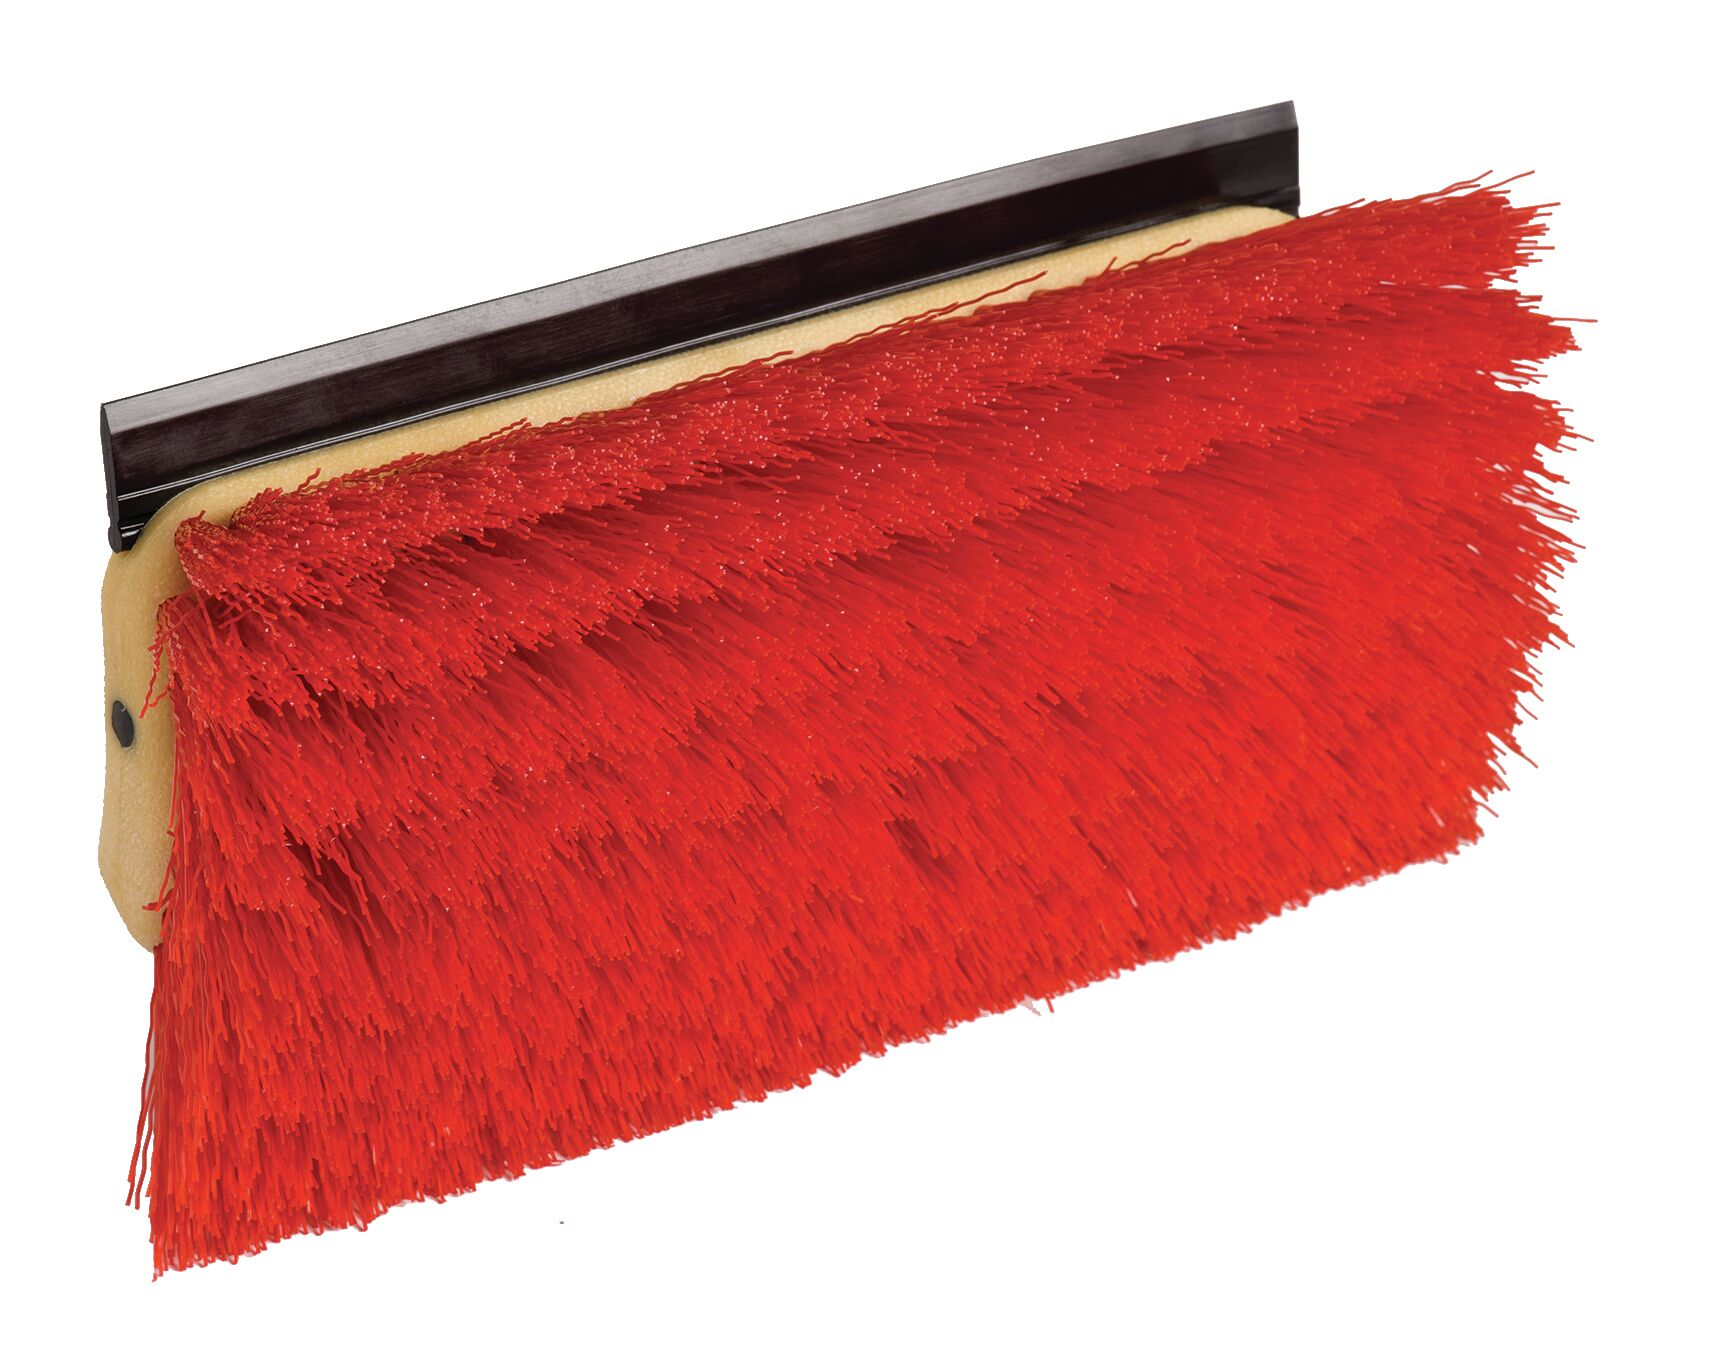 Bi-Level Floor Scrub Brush with Squeegee (Set of 6)